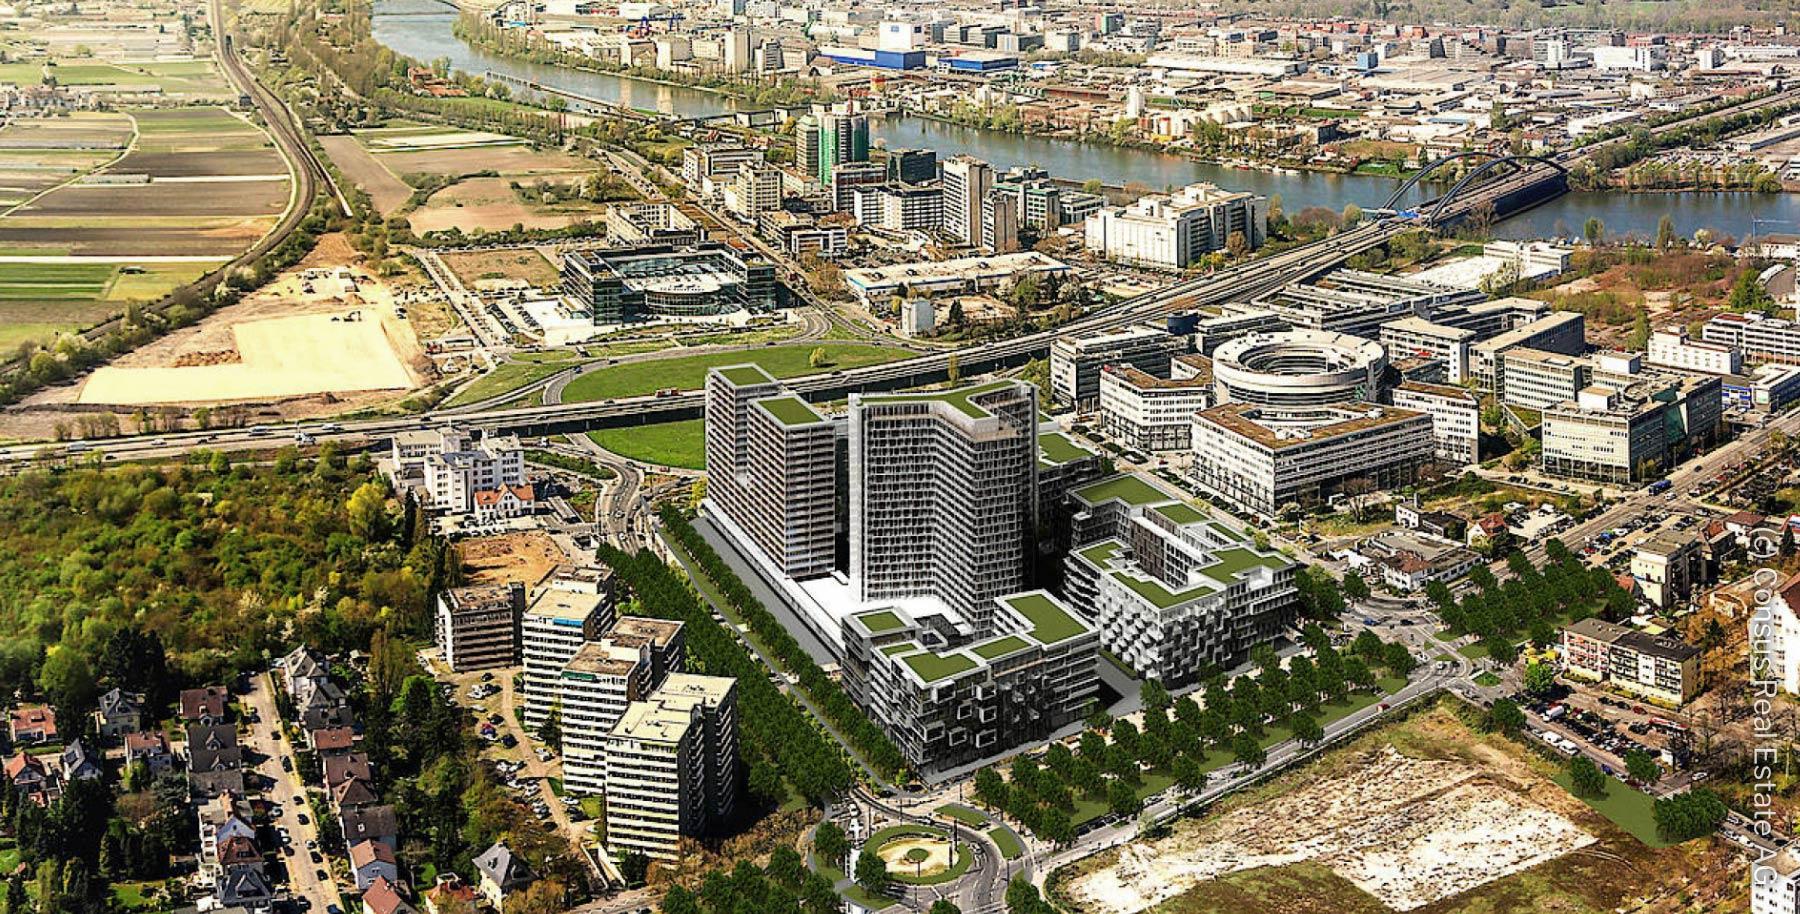 Vitopia Campus Offenbach am Main - New Frankfurt Towers - Kaiserlei Offenbach - Ehemalige Siemens Hochhäuser - CG Gruppe - Consus Real Estate AG